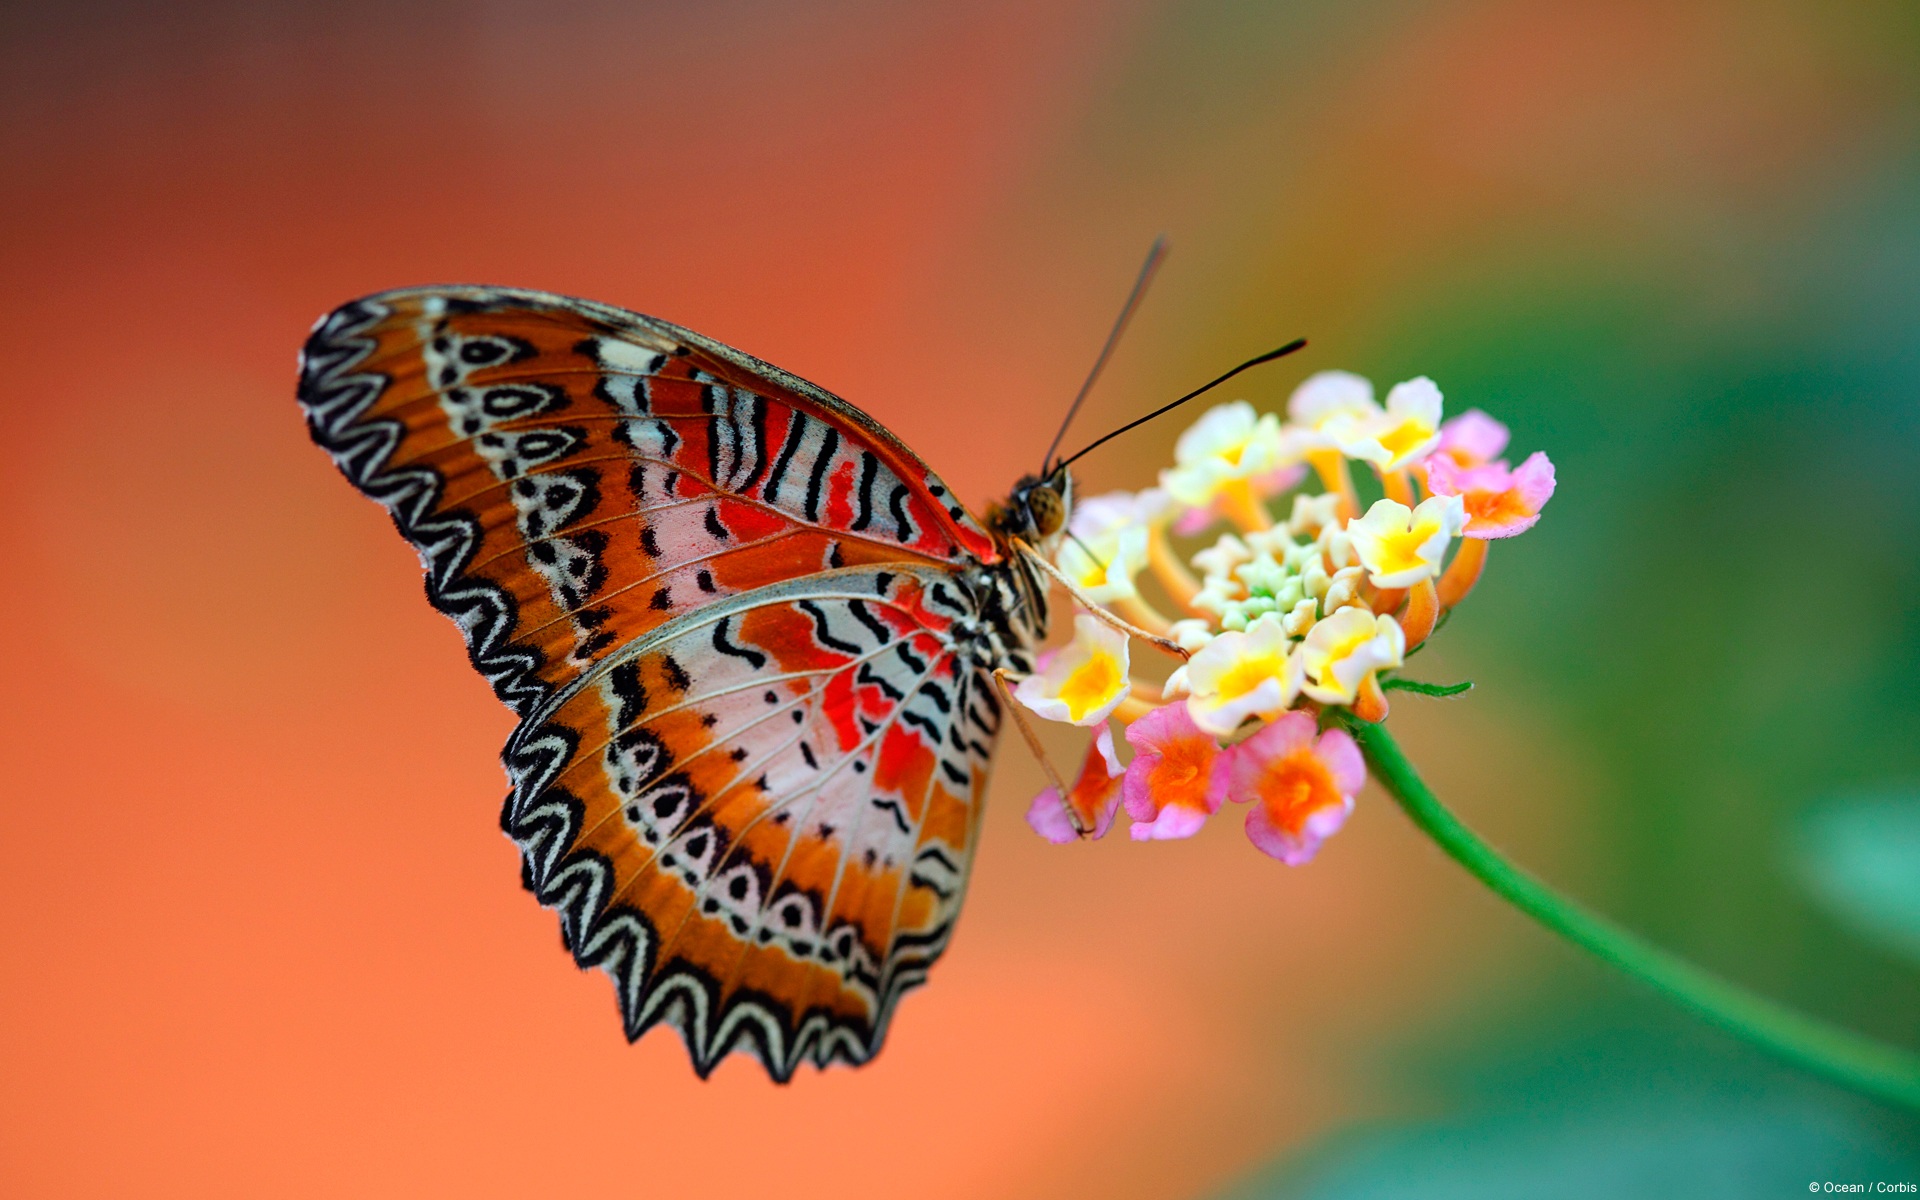 Butterfly on Flower Wallpapers | HD Wallpapers